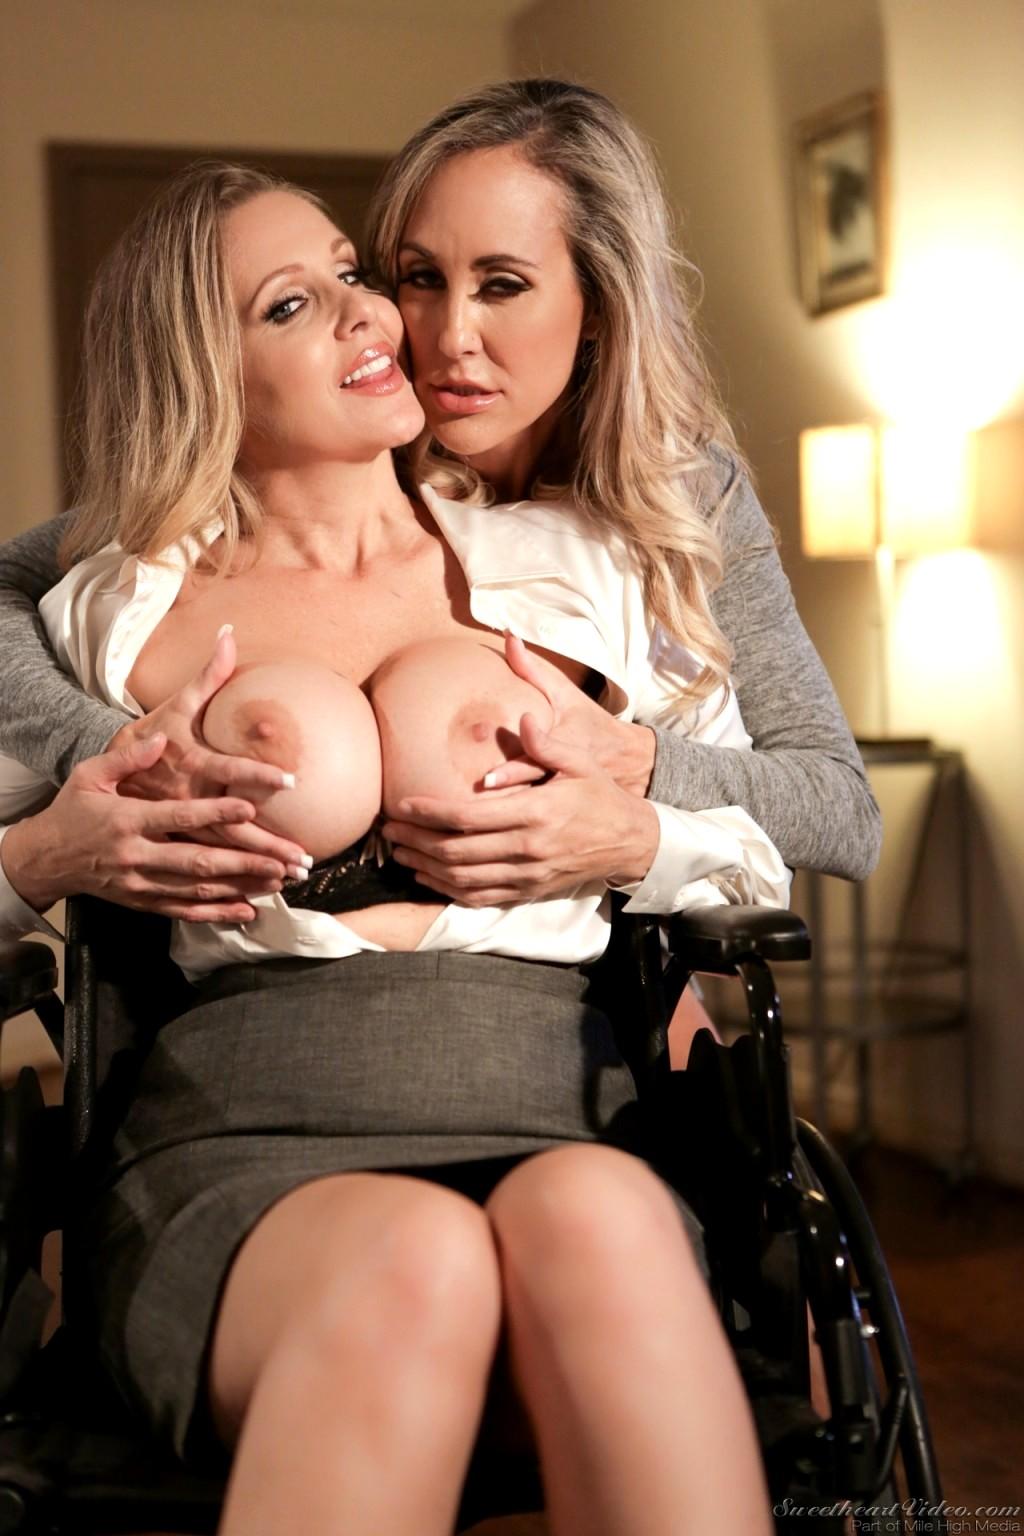 Julia ann and brandi love